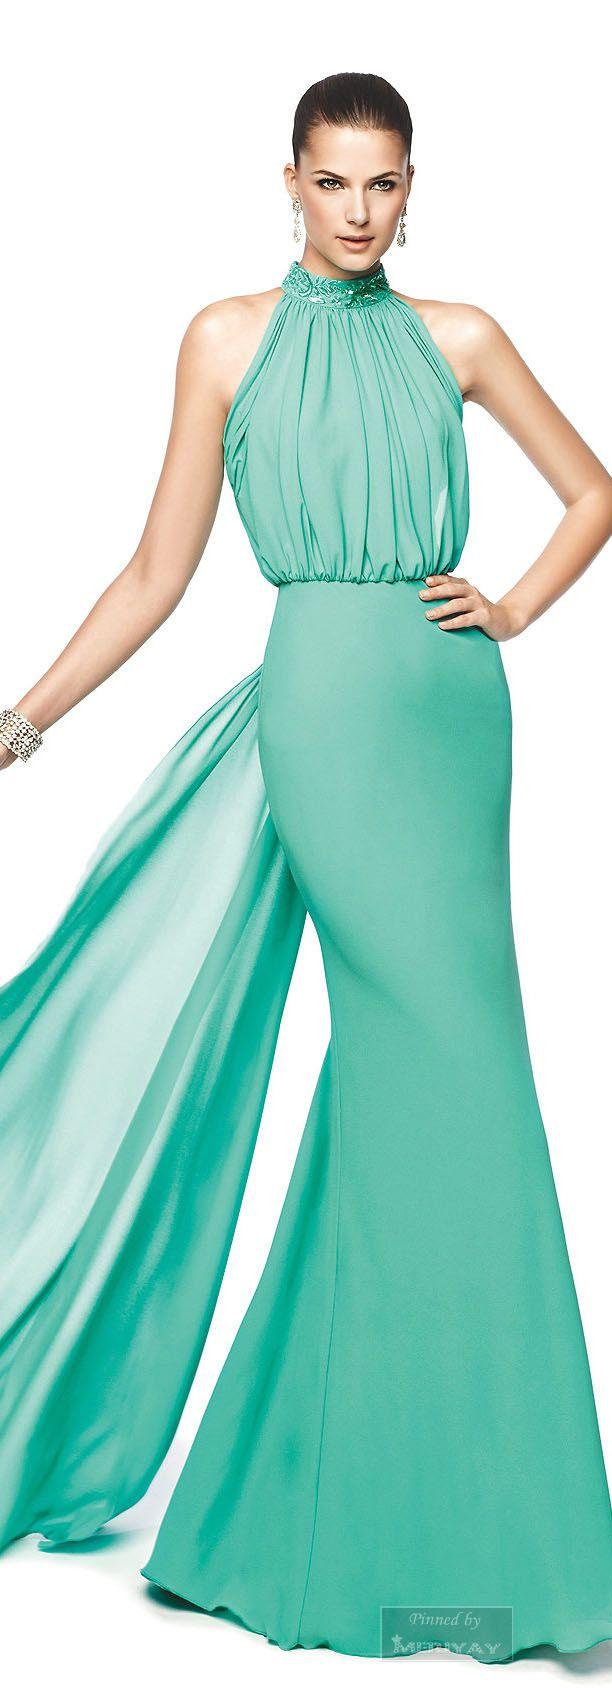 26 best vestidos images on Pinterest | Prom dresses, Evening gowns ...